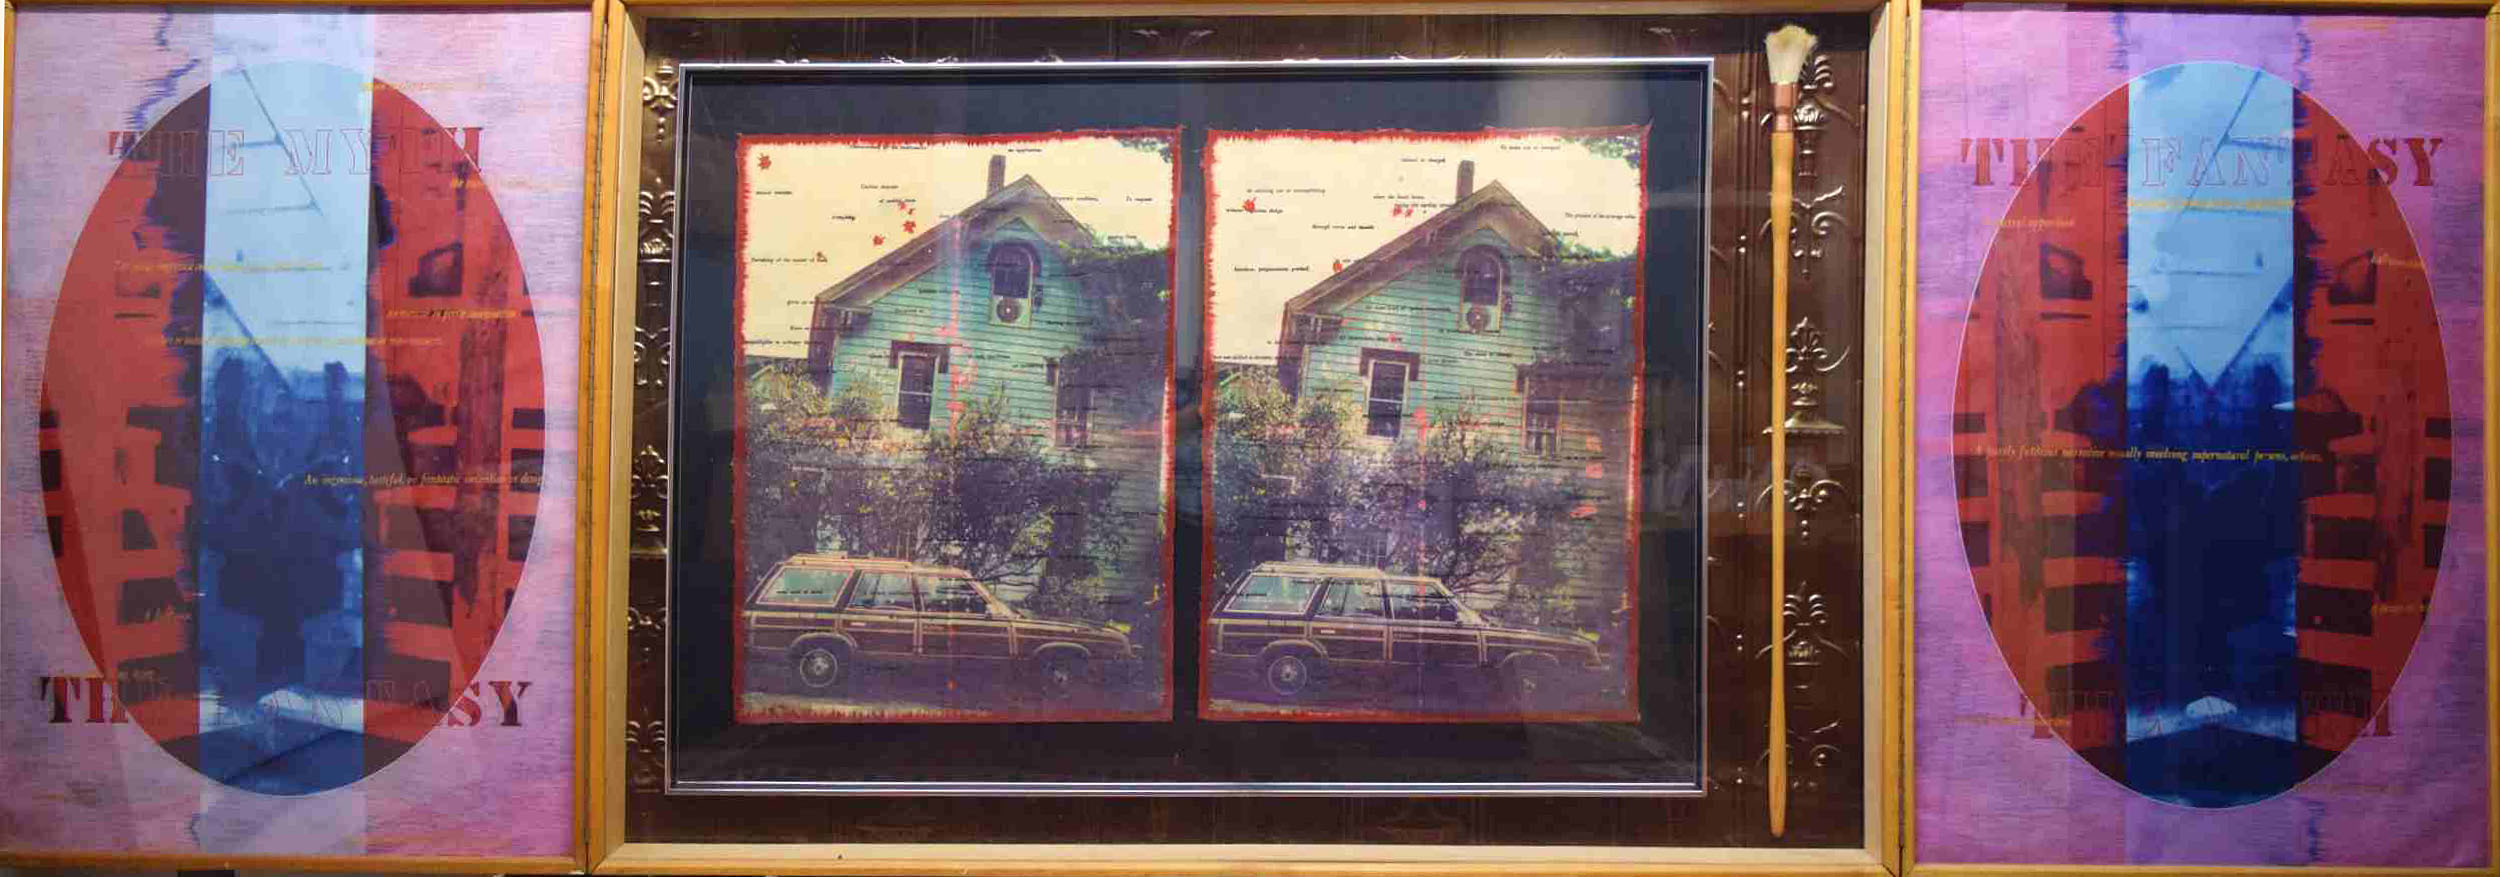 Greg Shattenberg, The Habit, 1991, mixed medium triptych, 118 x 39 inches (open) -